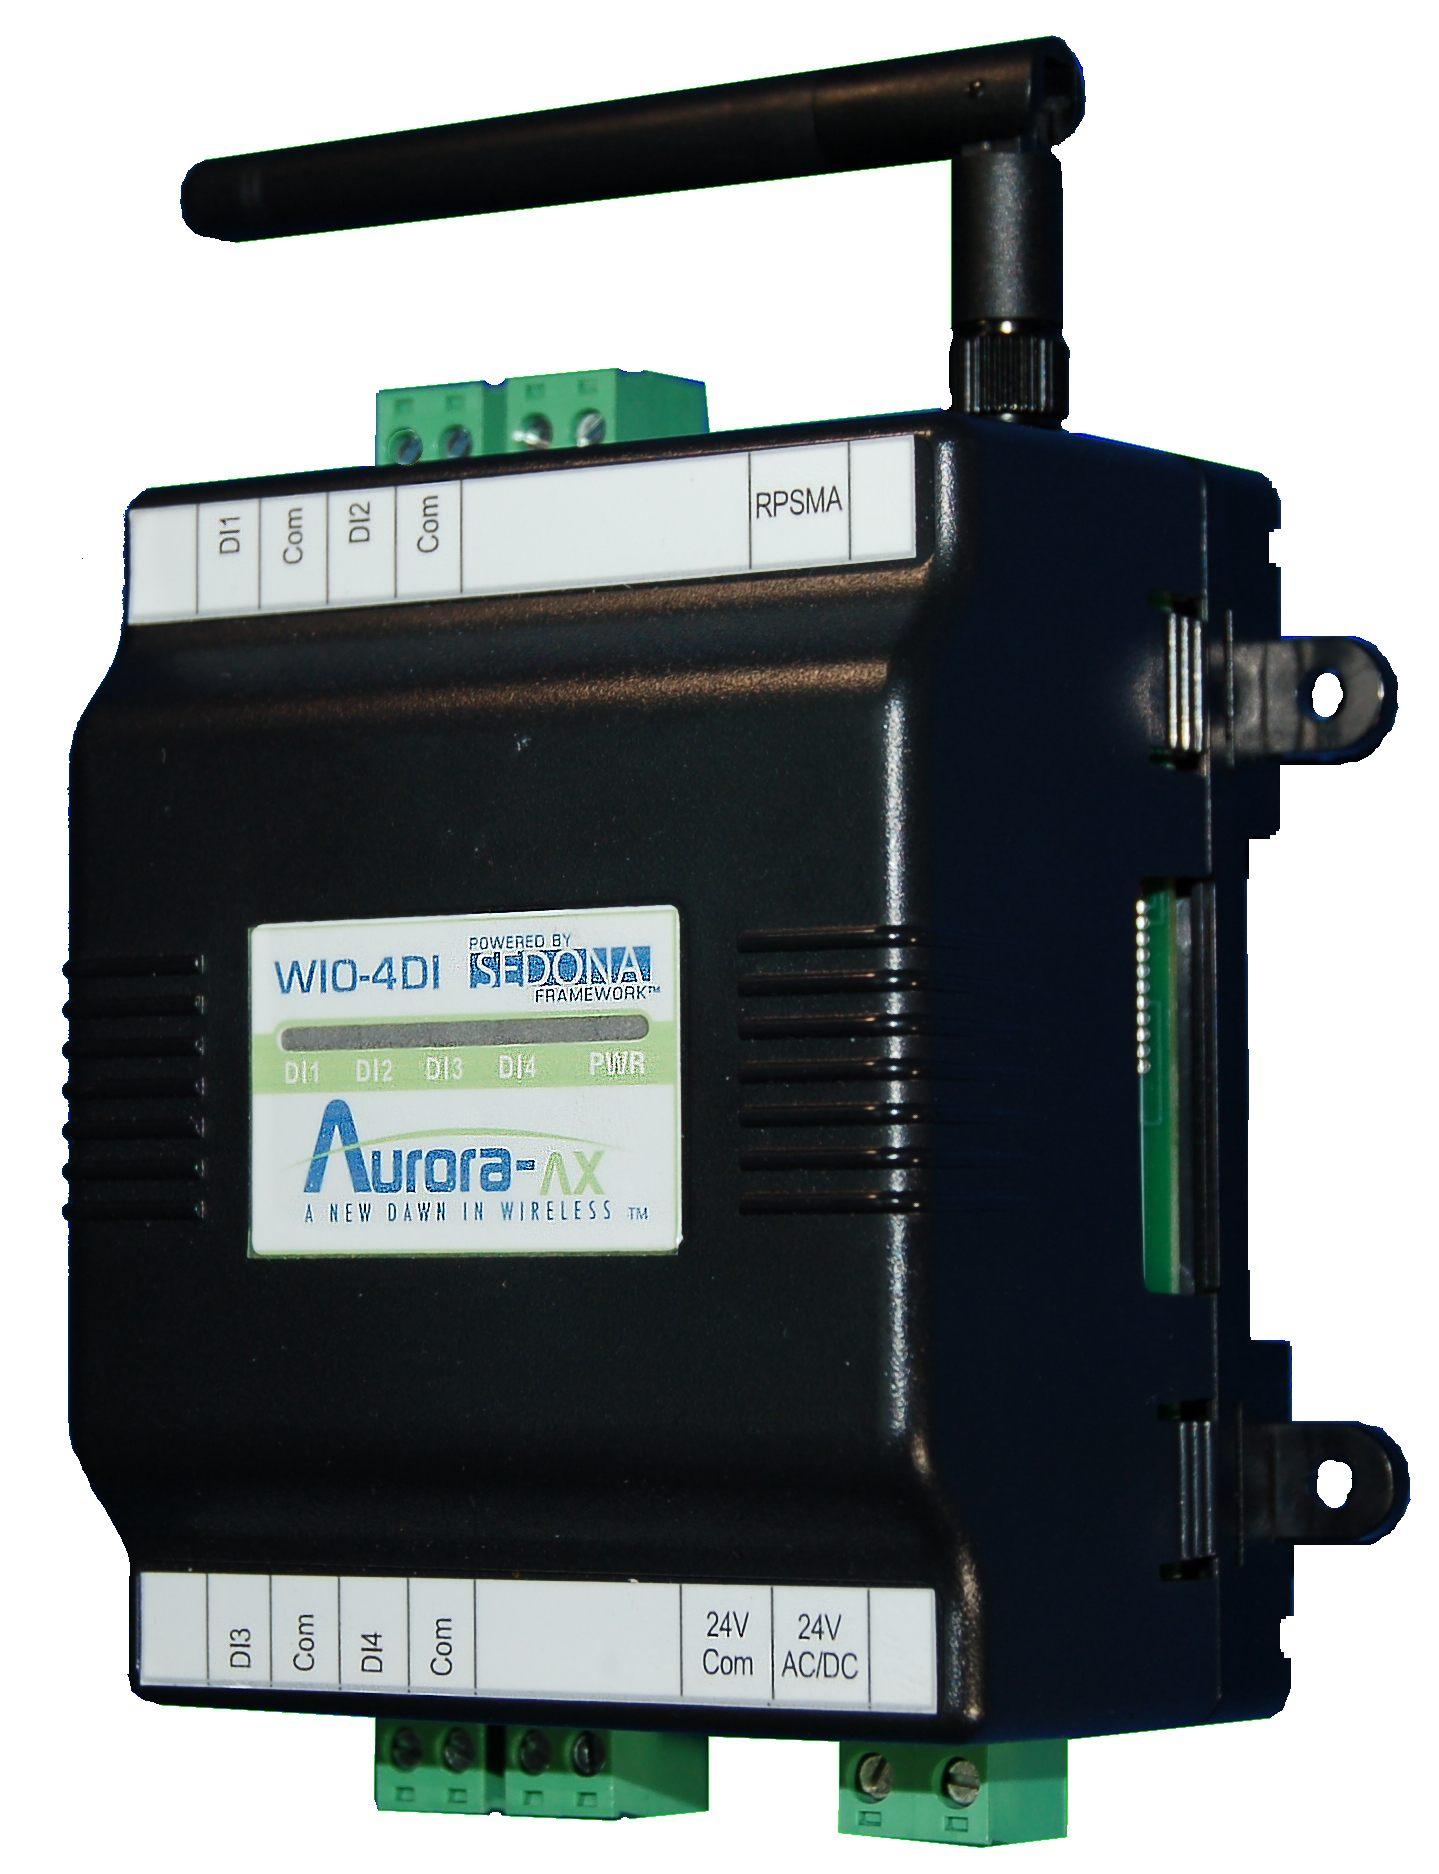 Wio 4 Aurora Ax Ddc Controls